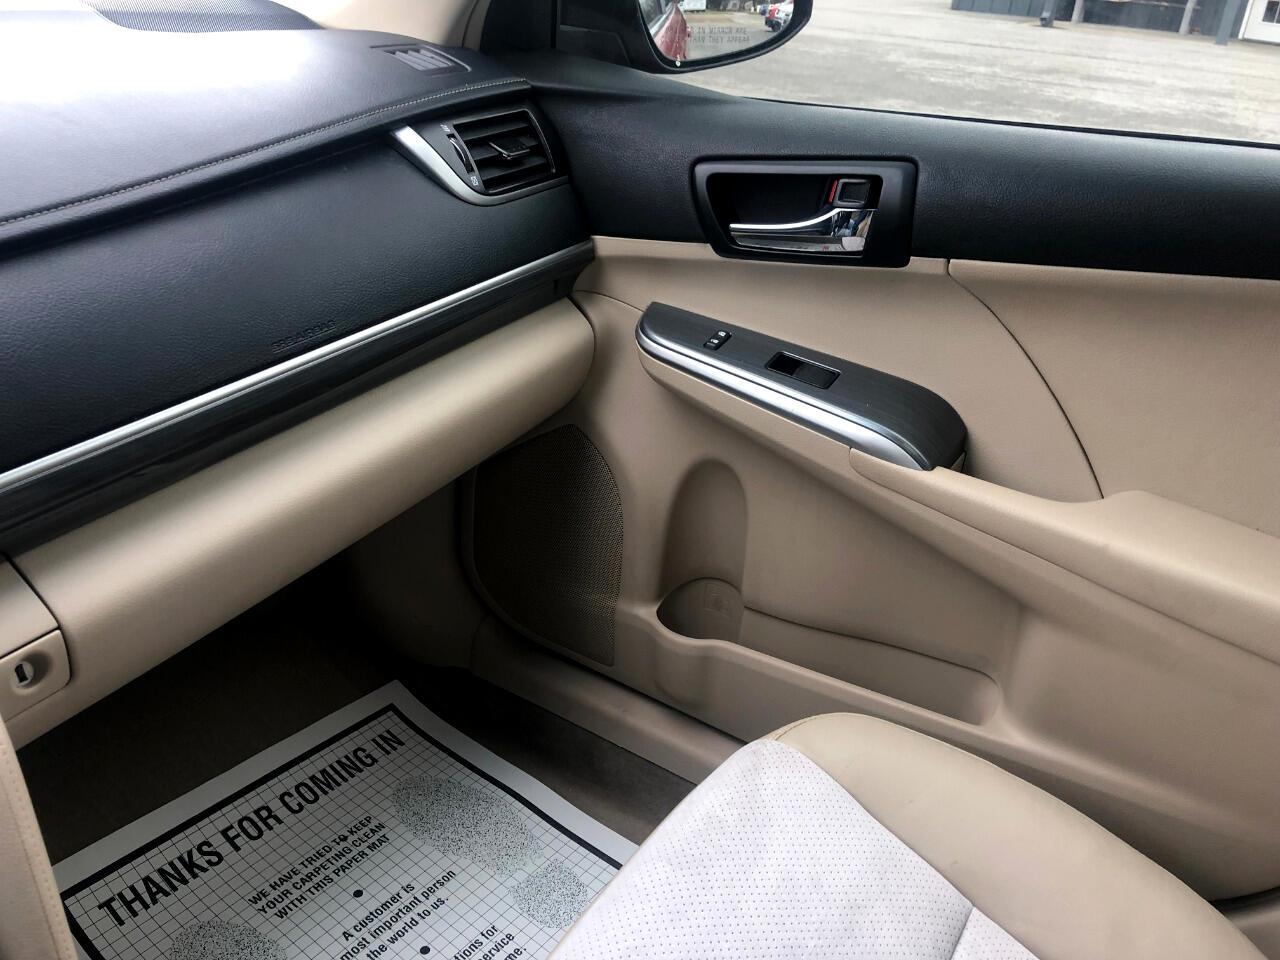 2012 Toyota Camry Hybrid XLE Sedan